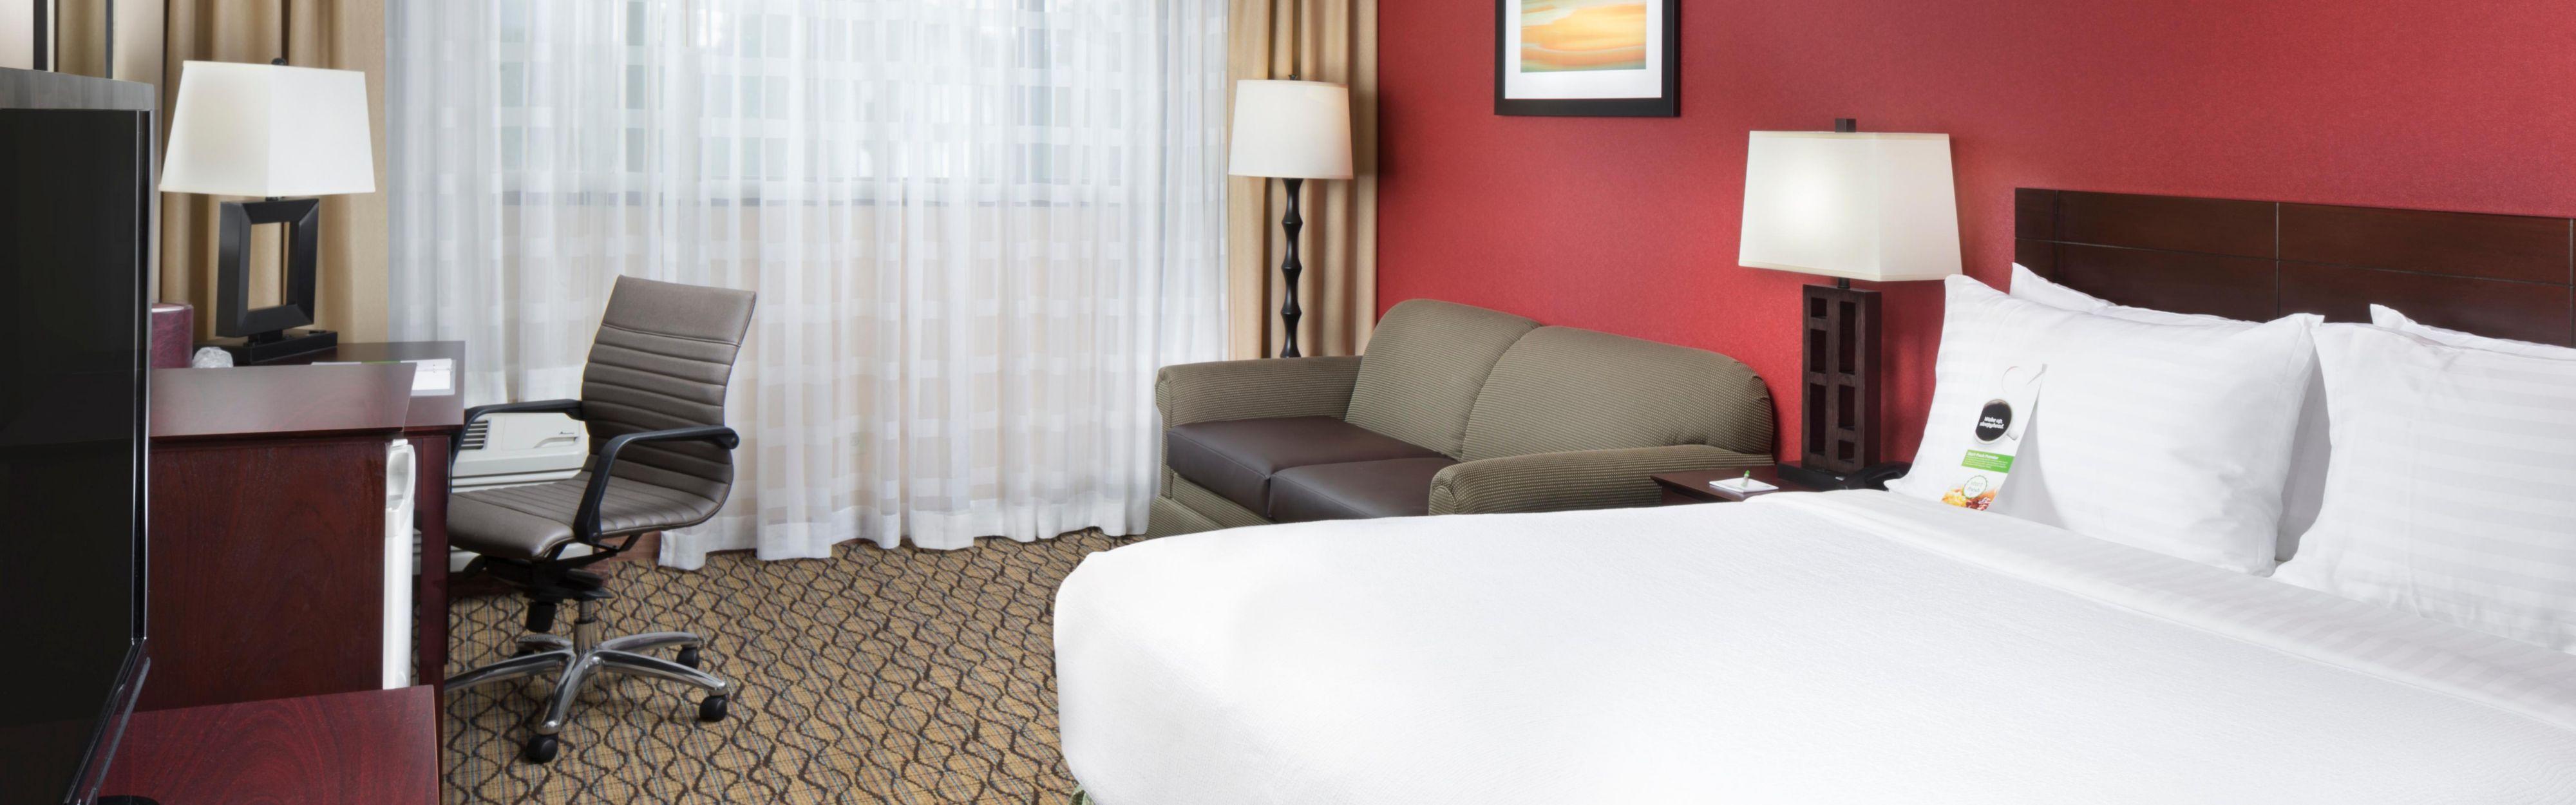 Holiday Inn Johnson City image 1